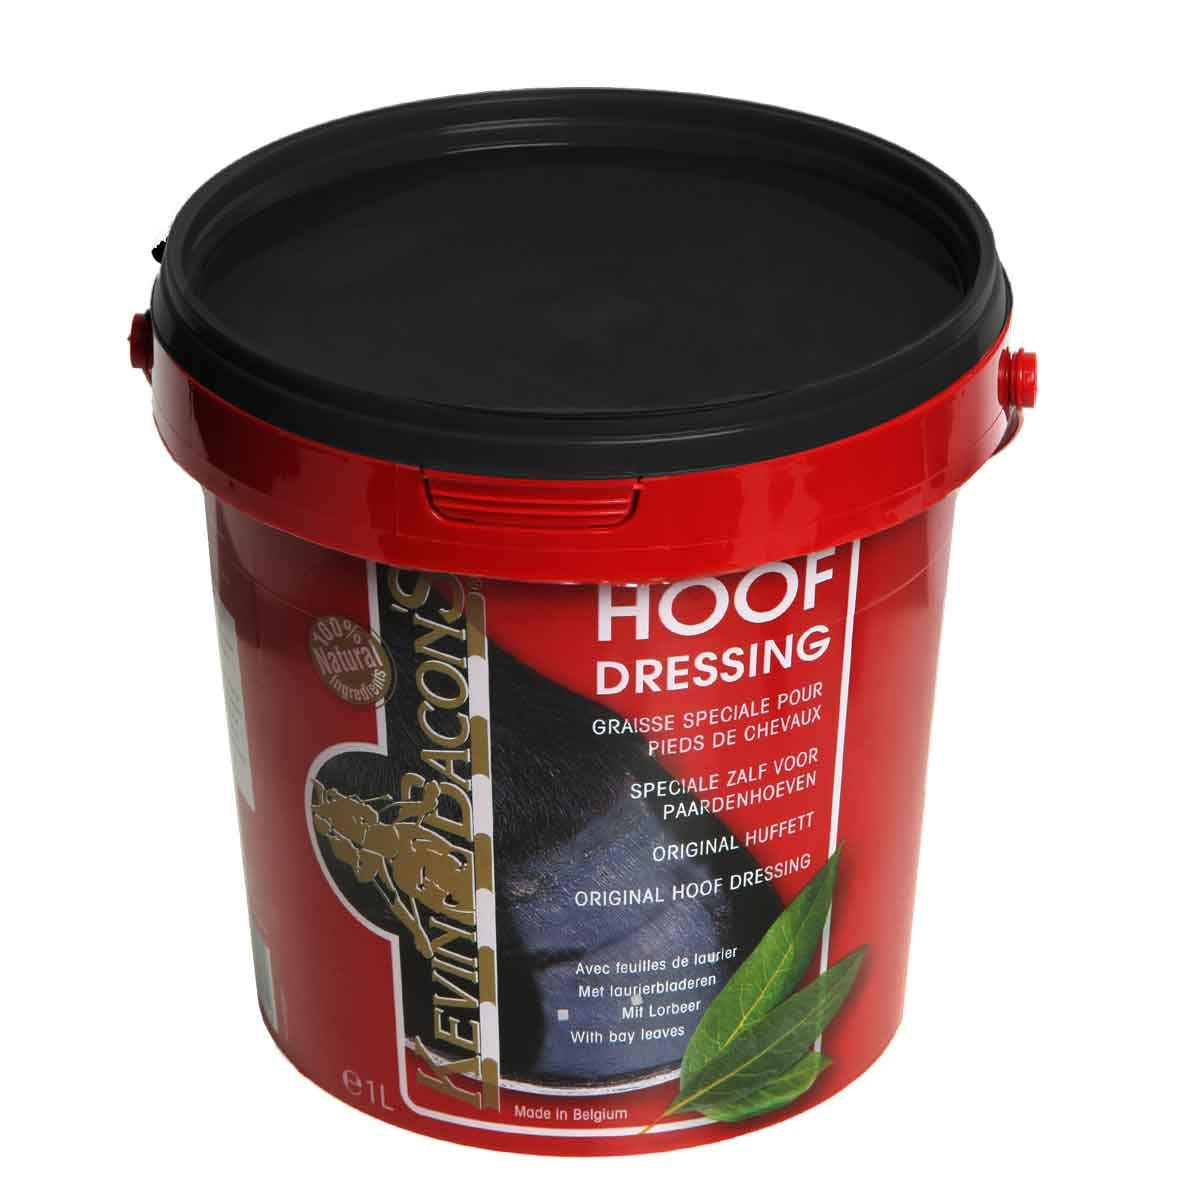 Kevin Bacon's Hoof Dressing ASH 1 Litre